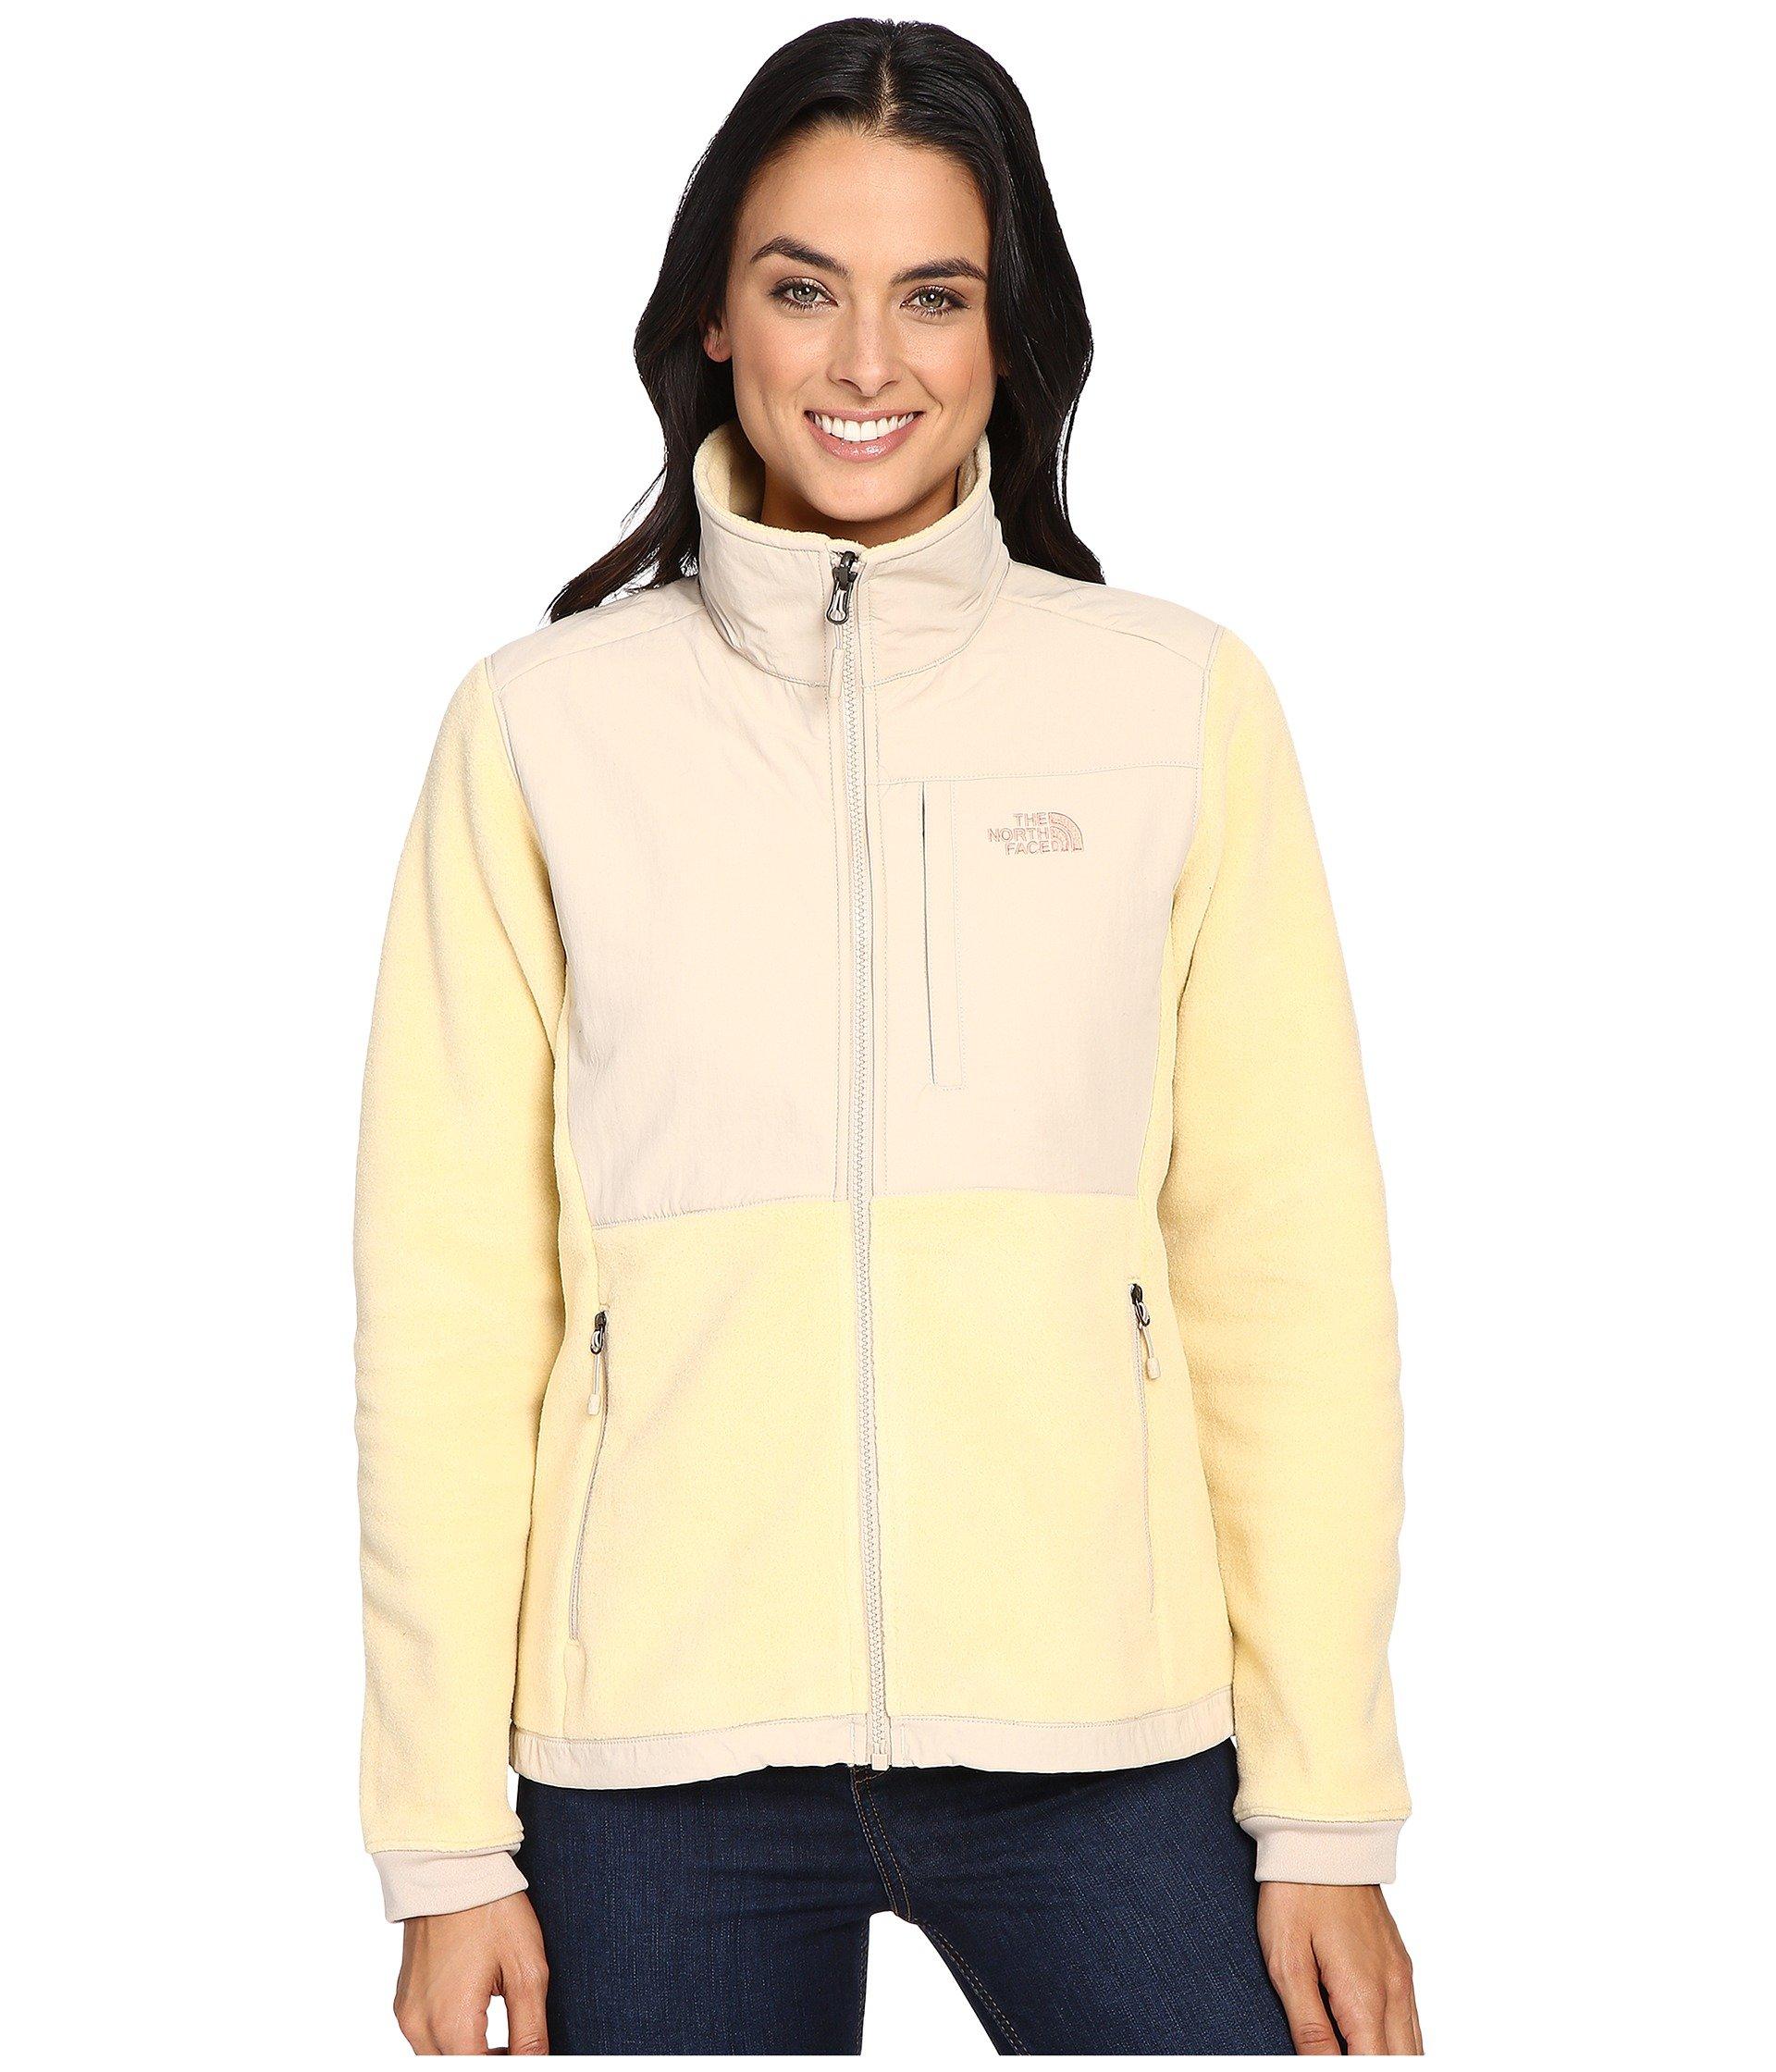 Denali 2 Jacket, Marzipan/Doeskin Brown (Prior Season)